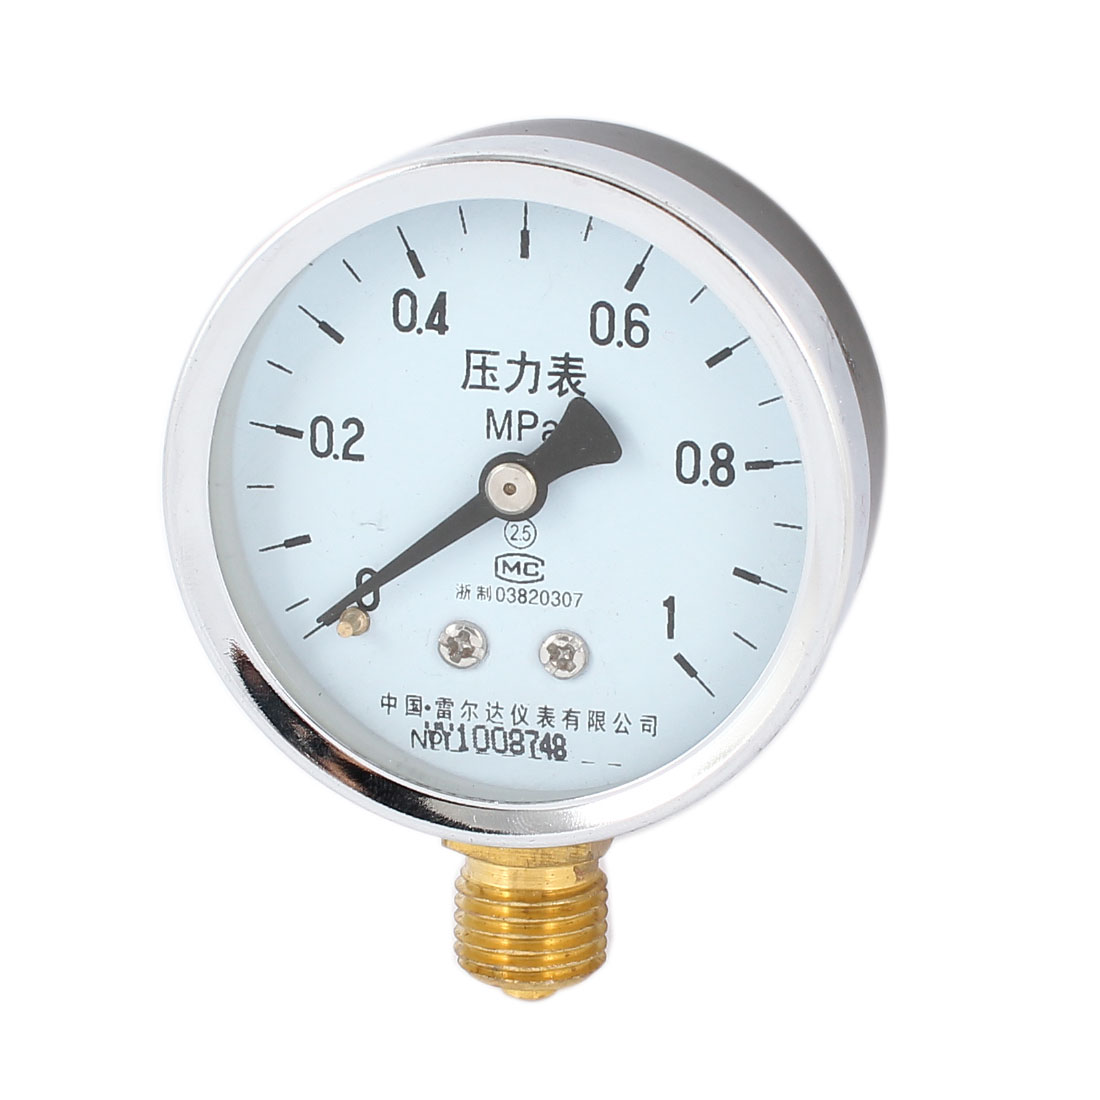 0-1 MPa 14mm Male Threaded Pneumatic Pressure Gauge Black Silver Gold Tone